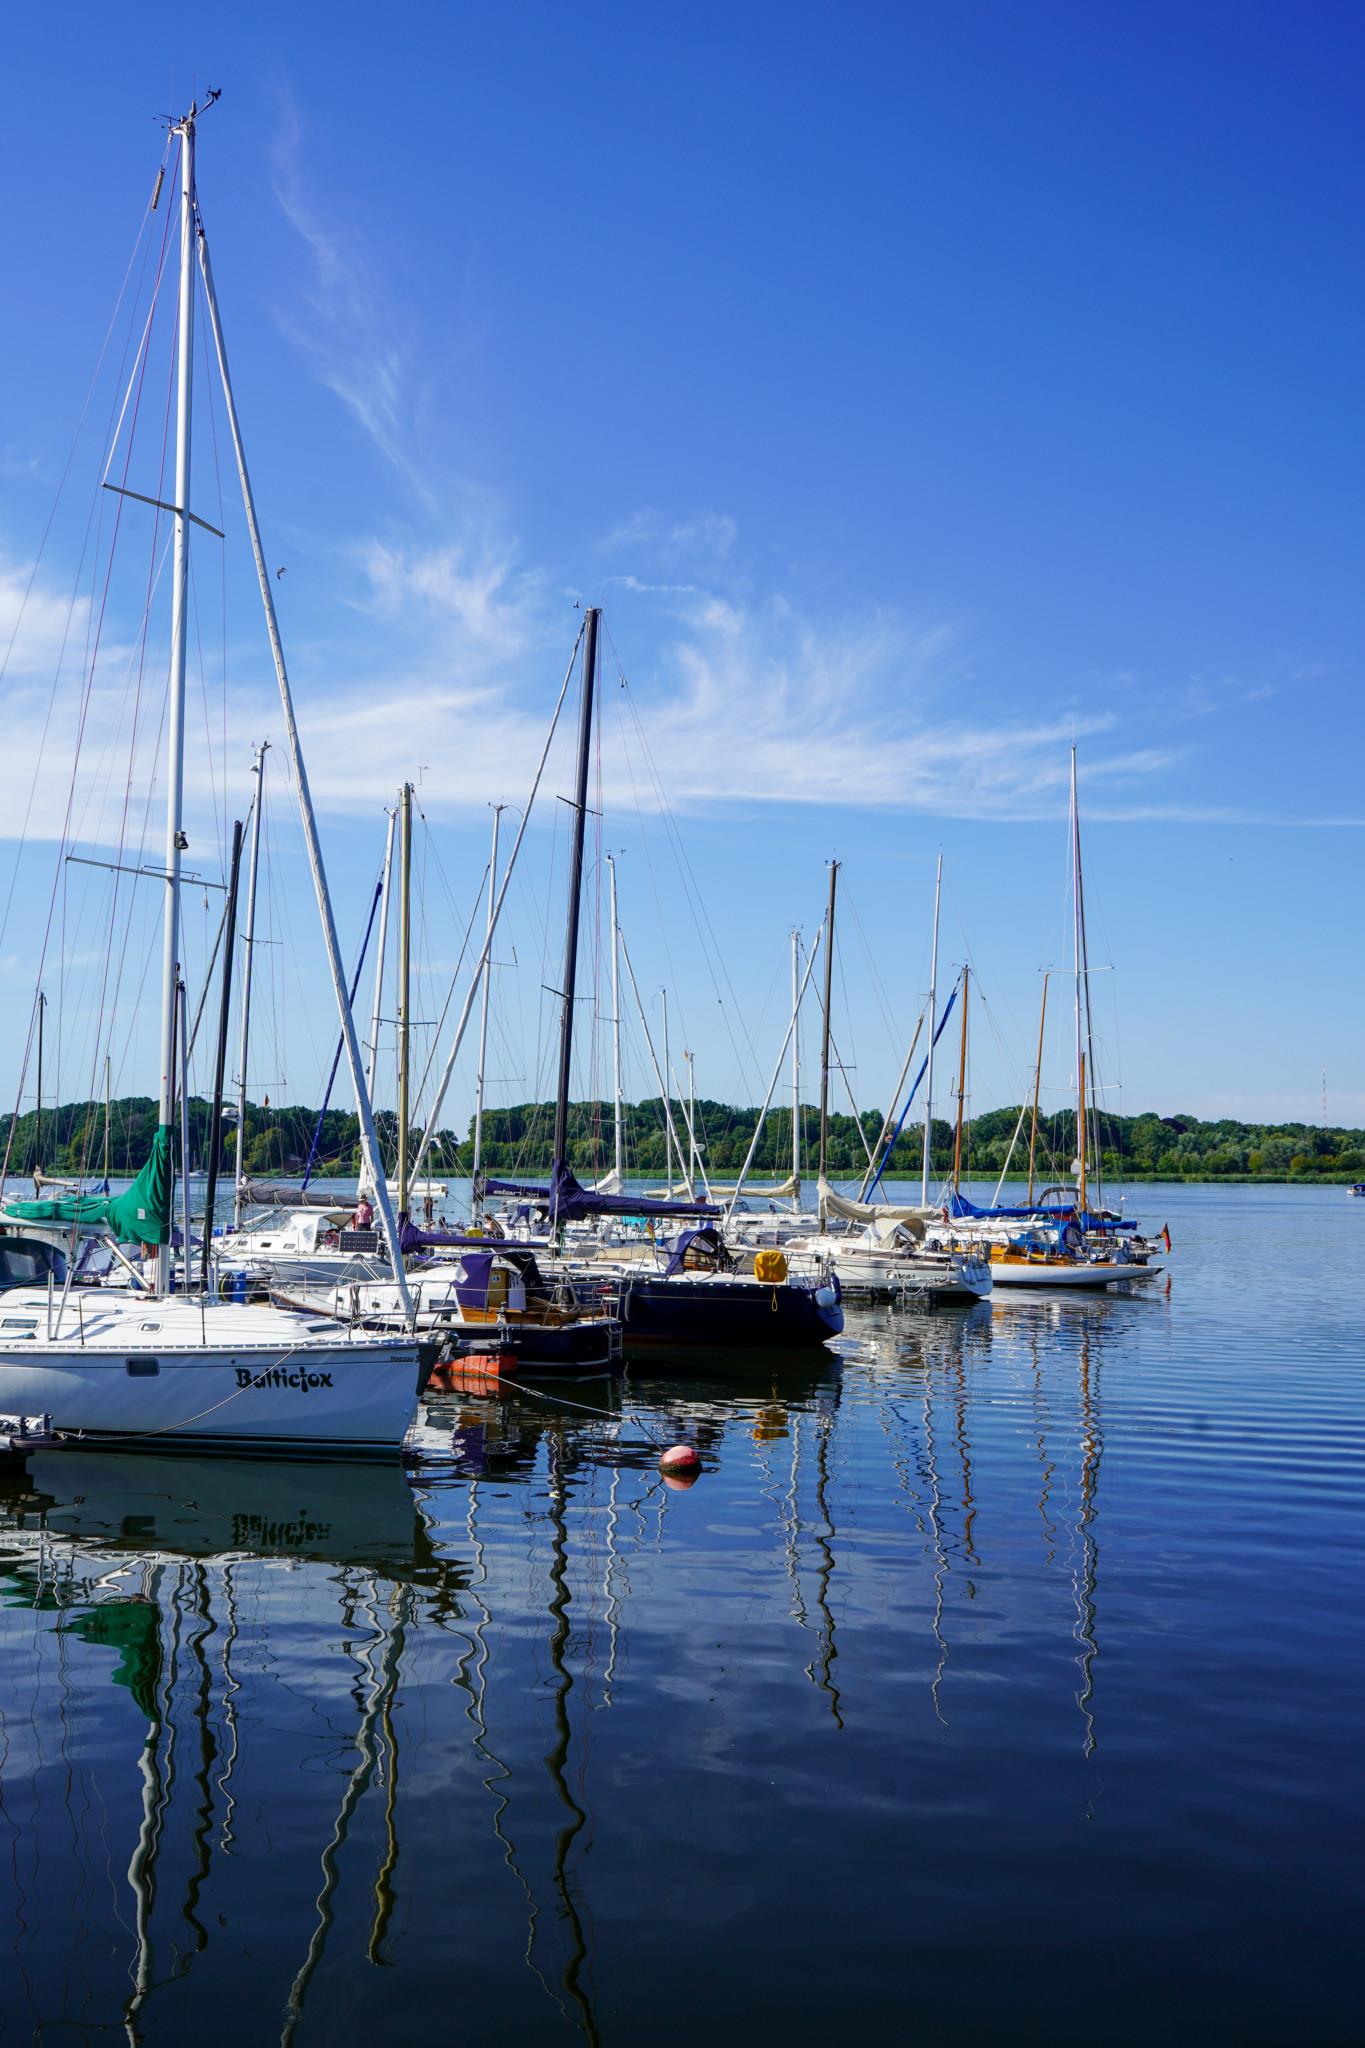 Marina im Stadthafen Rostock